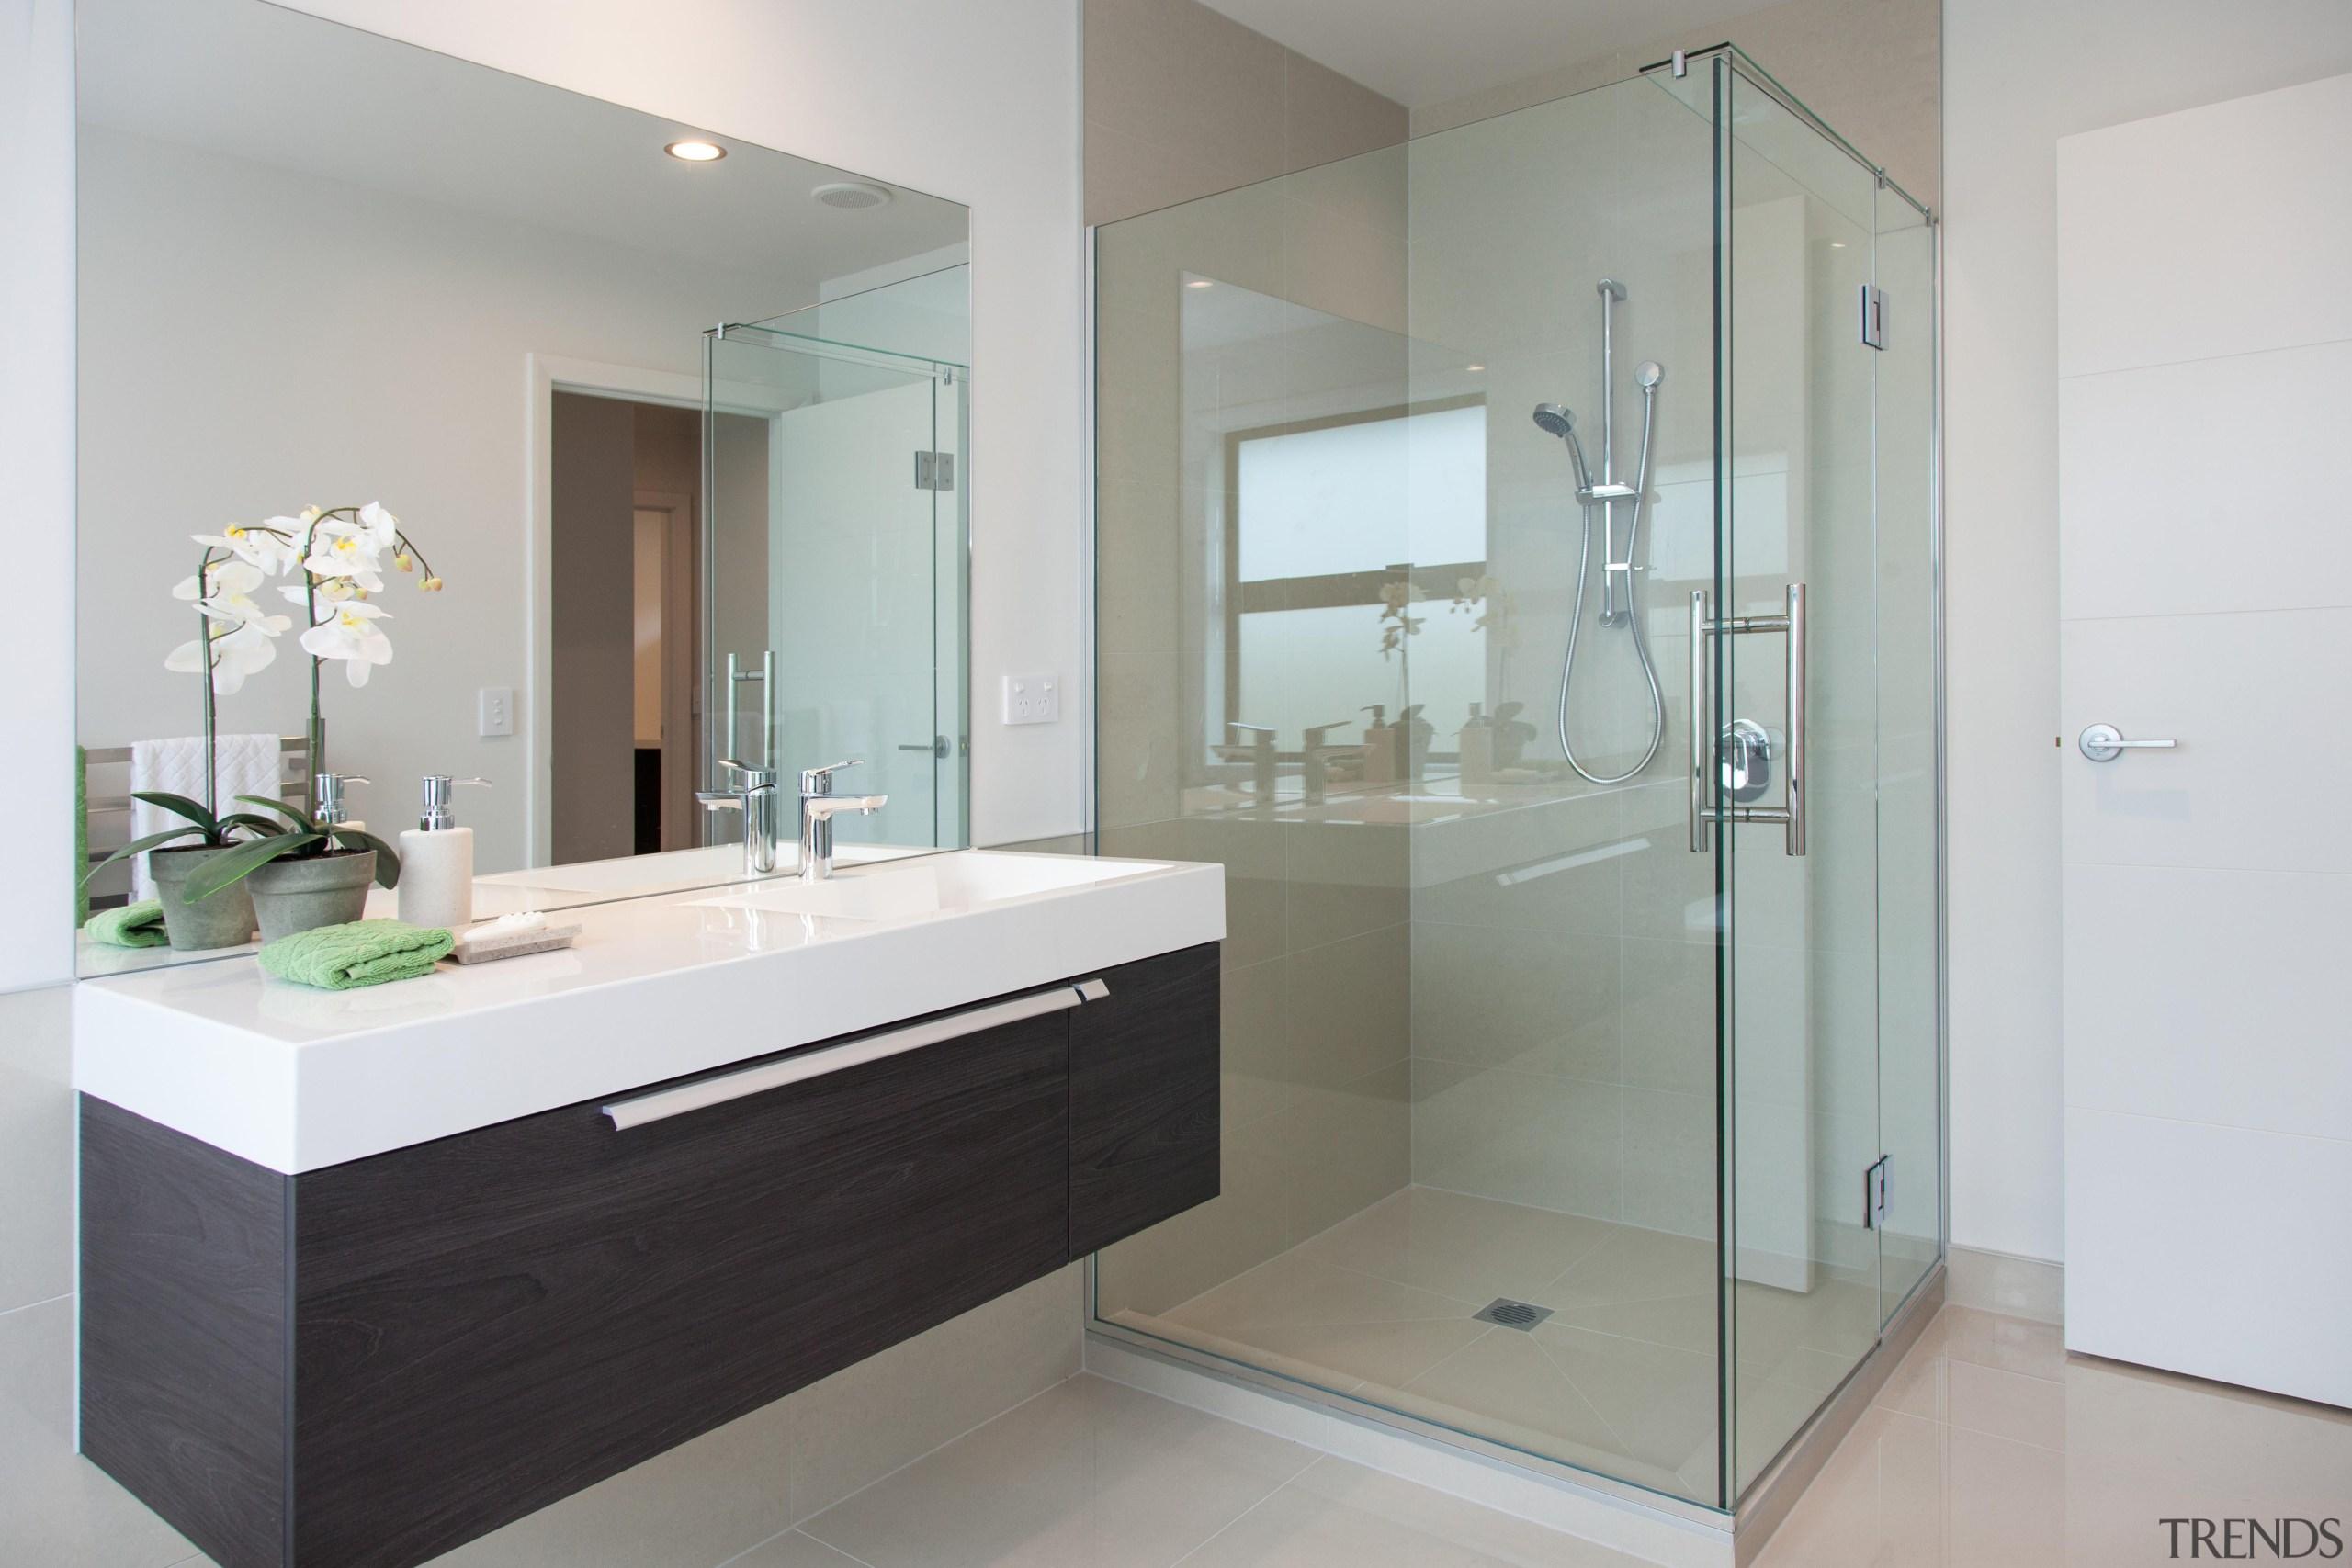 gjgardner0206.jpg - gjgardner0206.jpg - bathroom | bathroom accessory bathroom, bathroom accessory, bathroom cabinet, glass, interior design, product design, room, gray